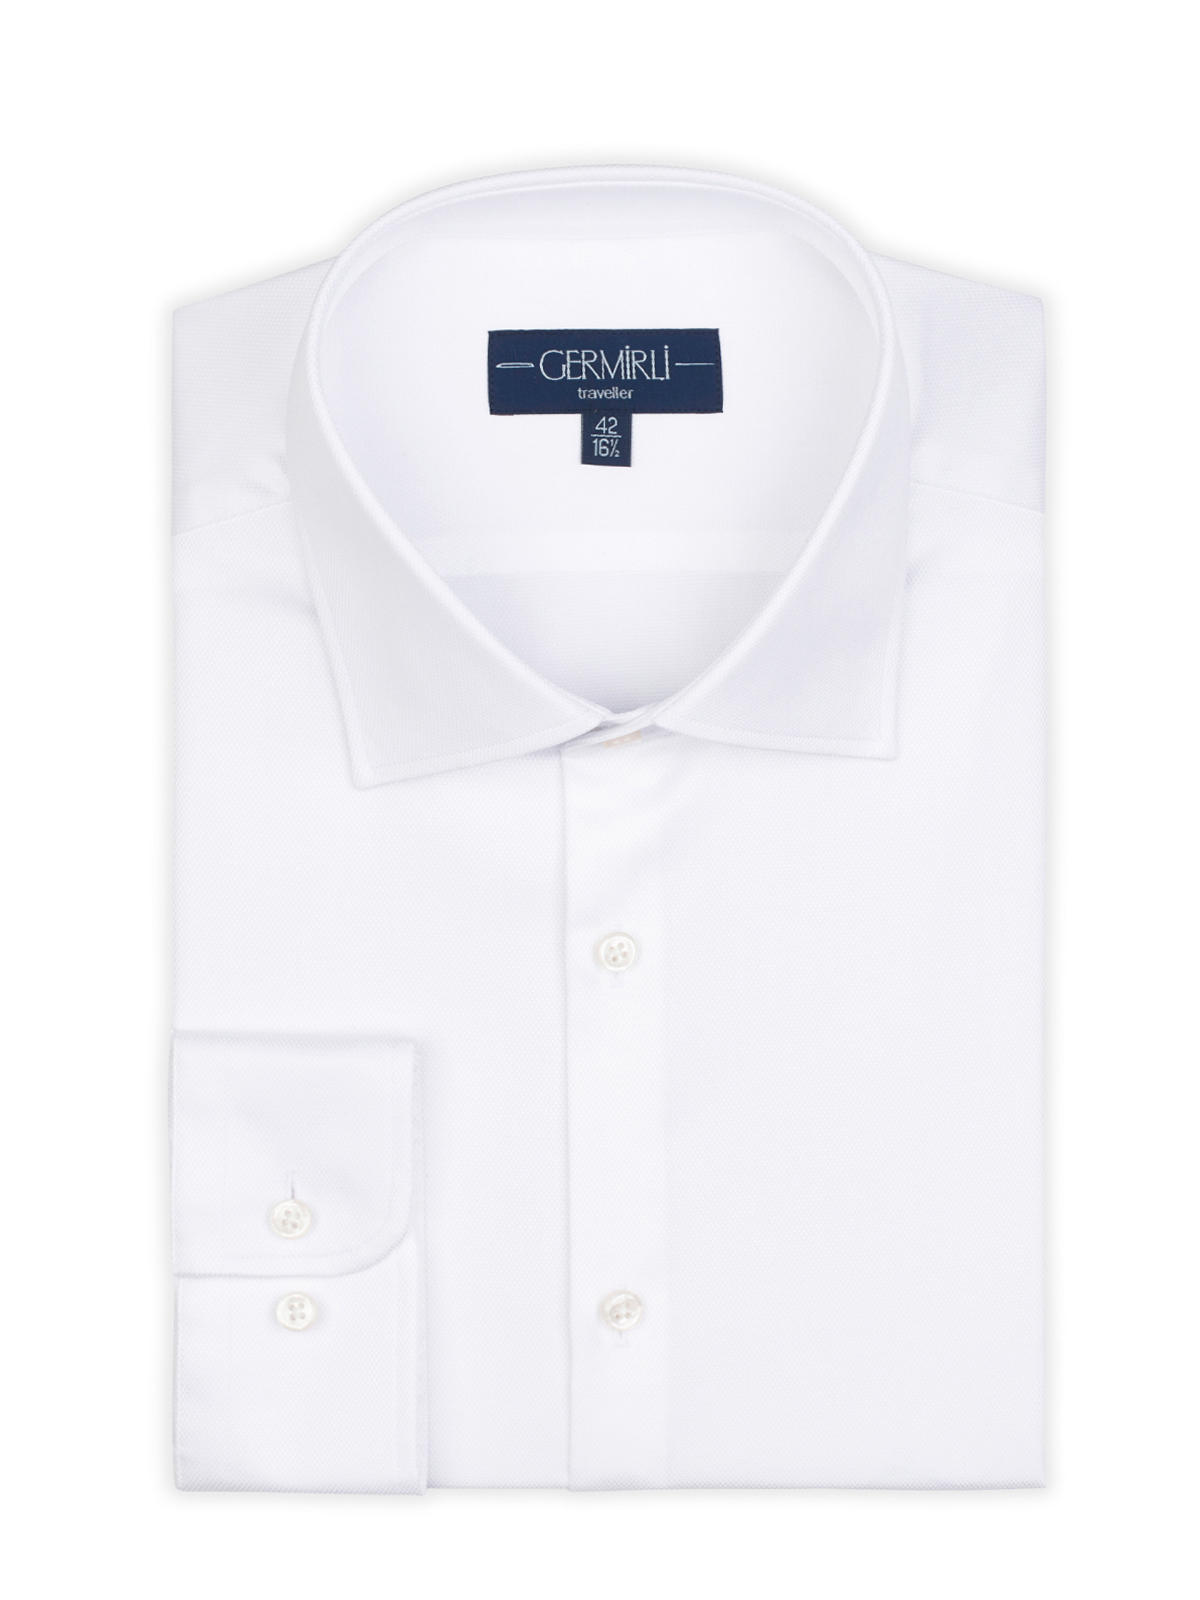 Germirli Non Iron White Oxford Semi Spread Tailor Fit Jouney Shirt